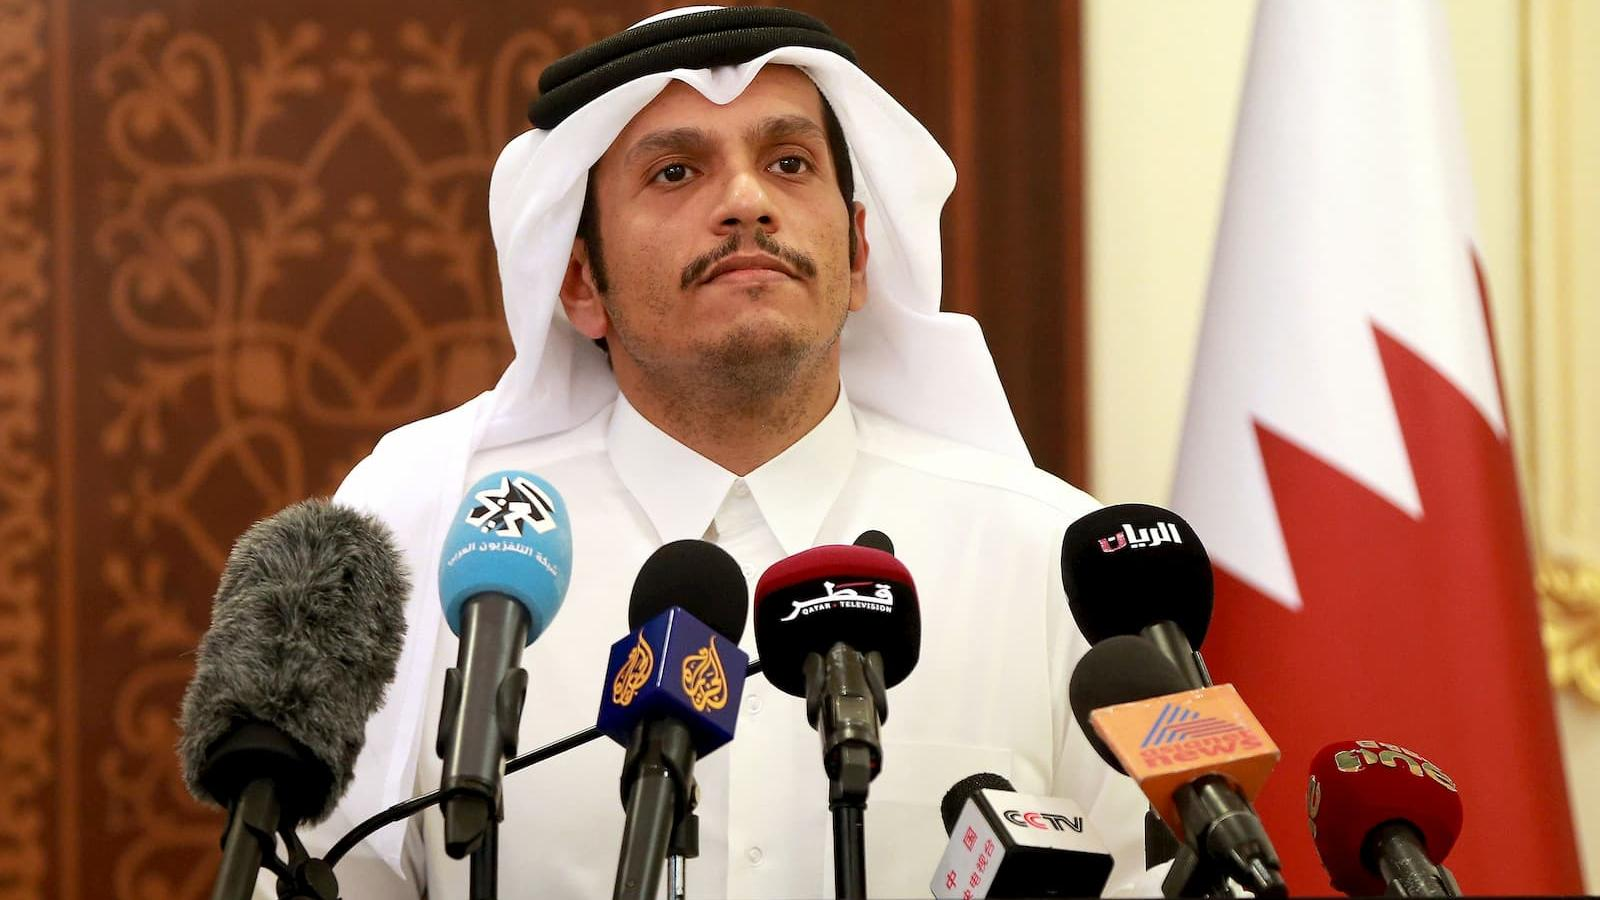 Some progress in communication with UAE, says Qatar's FM